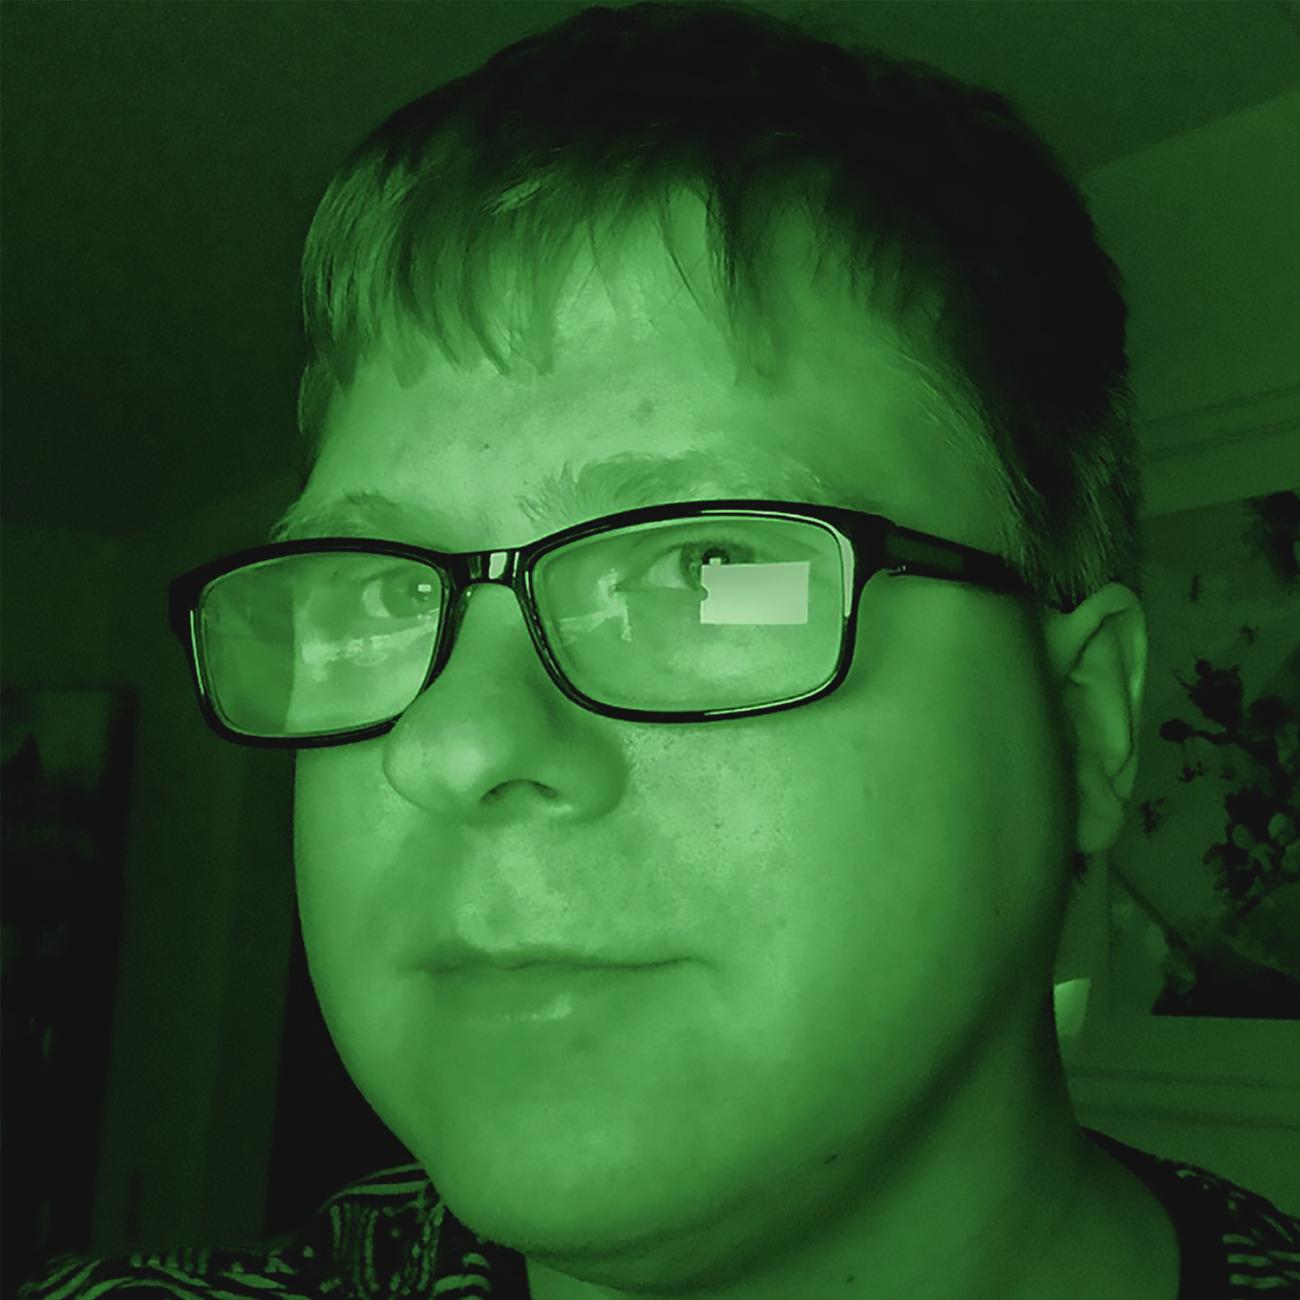 david-bio-pic-green.jpg